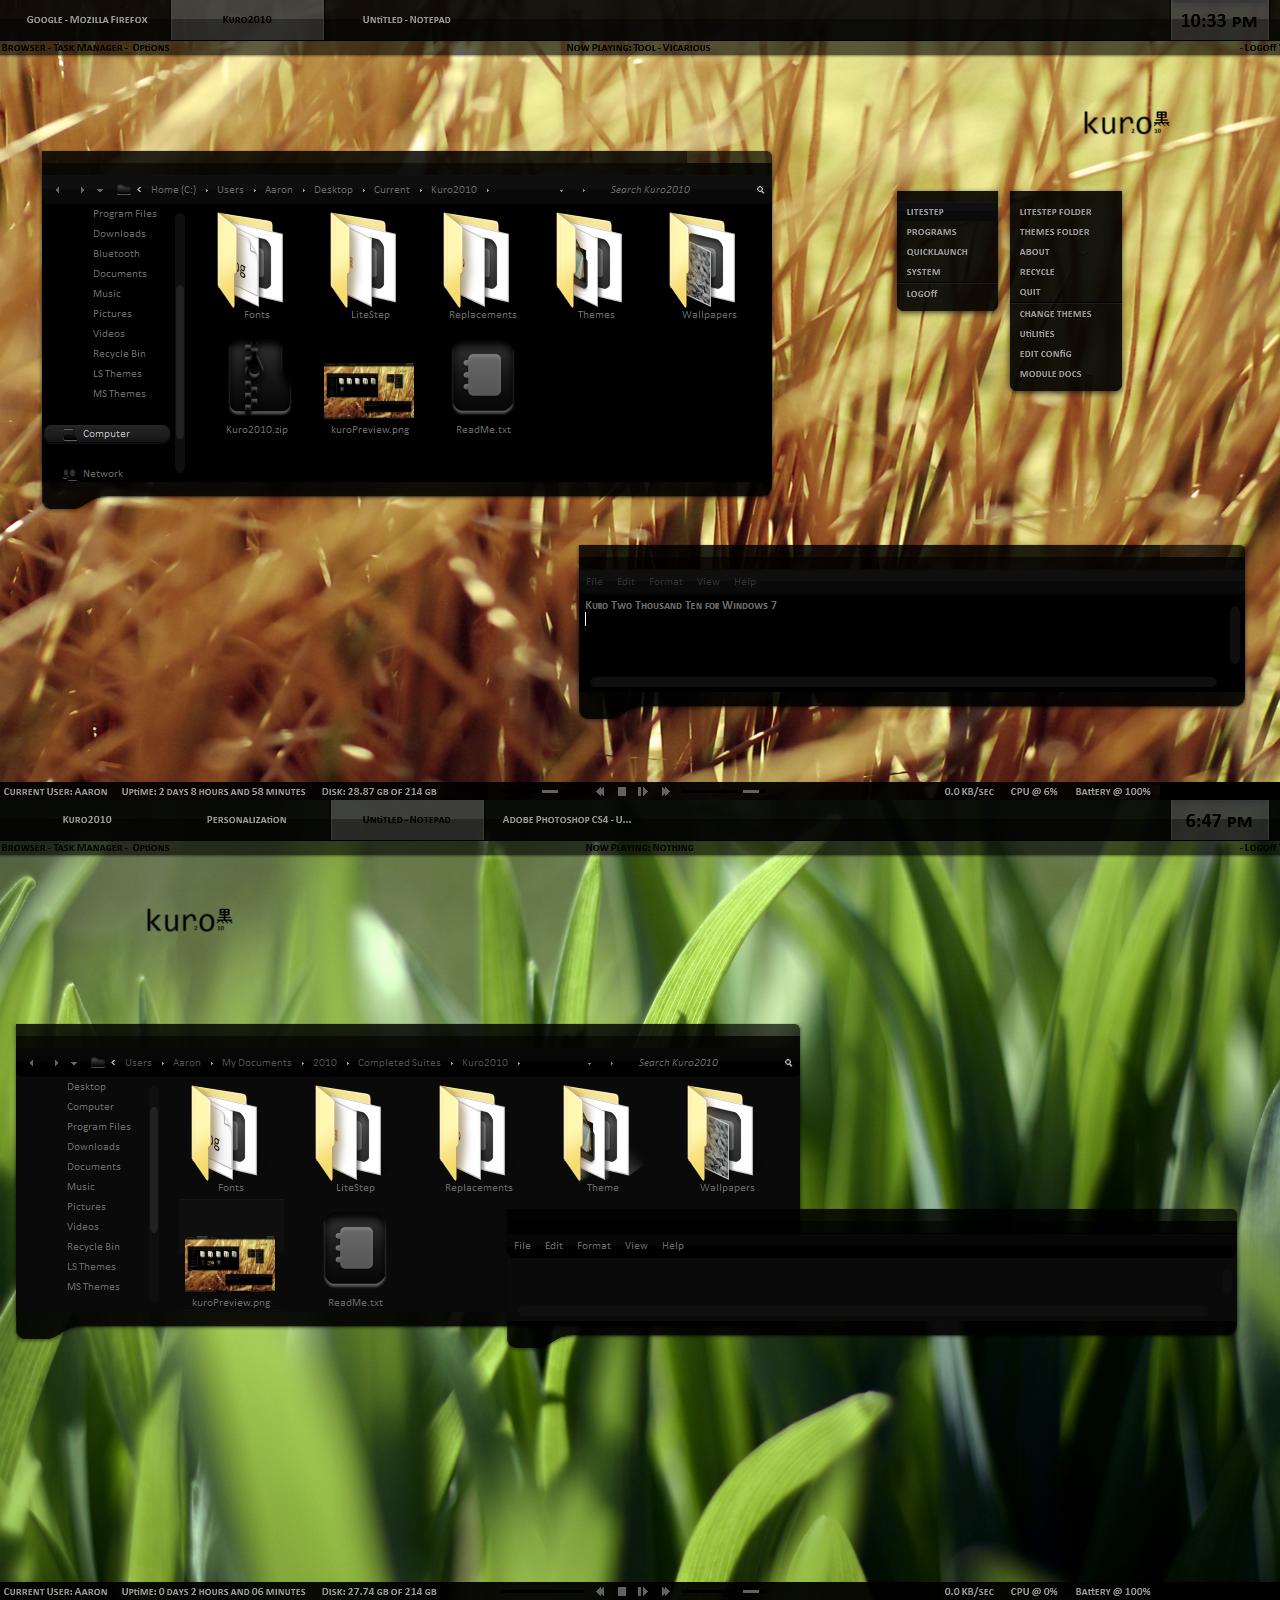 Kuro 2010 for Windows 7